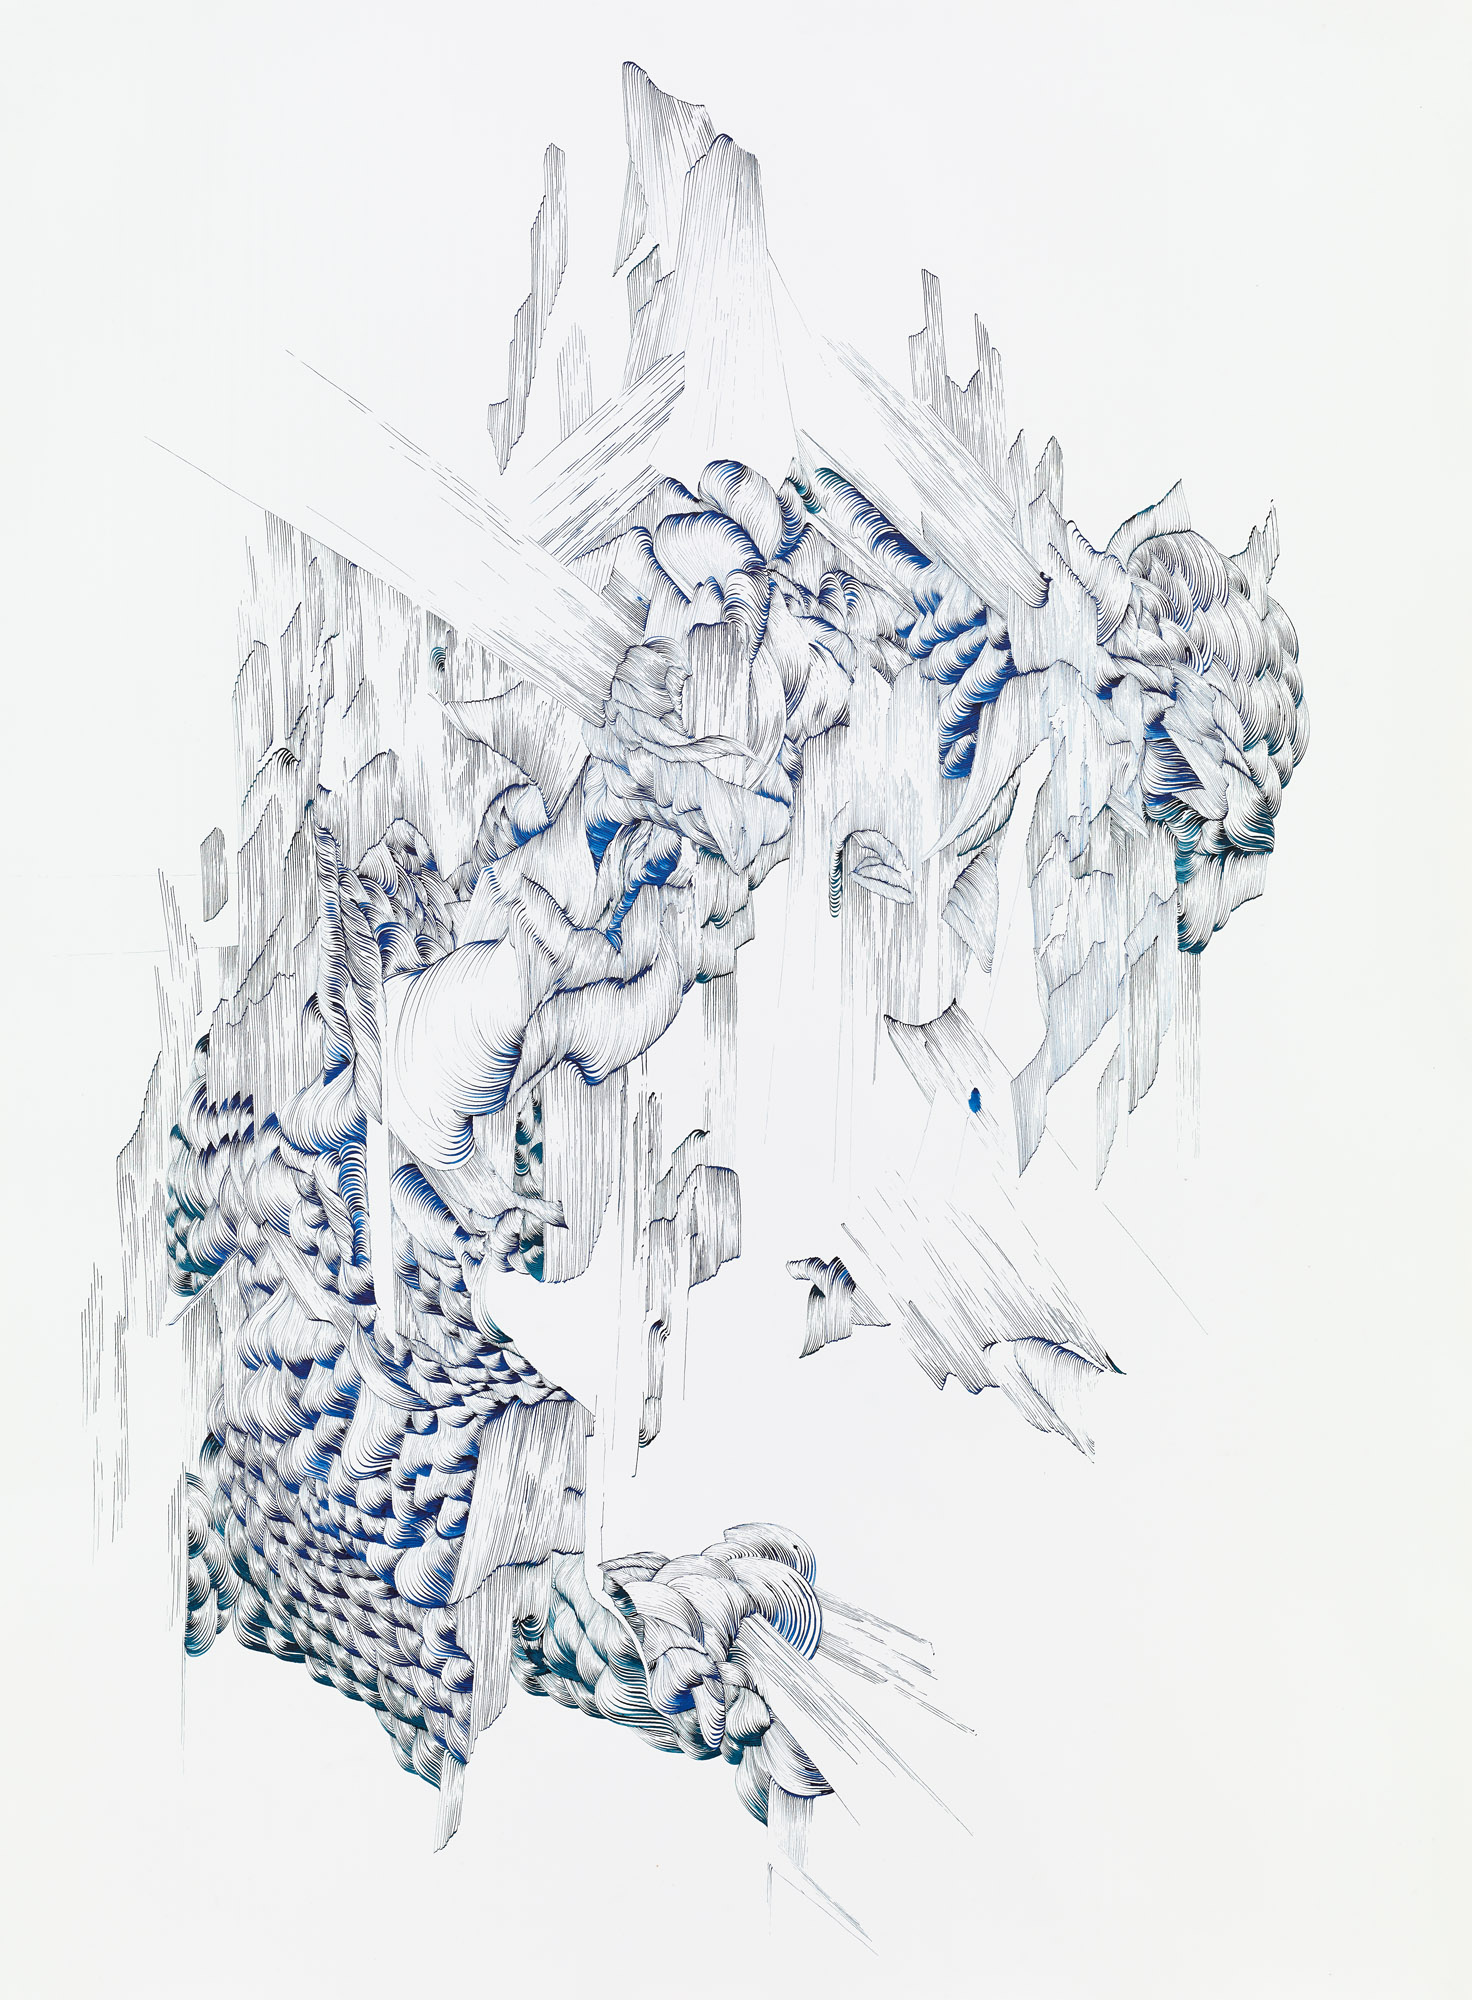 BK P142 | untitled | blue ink on paper | 120x100cm | 2014